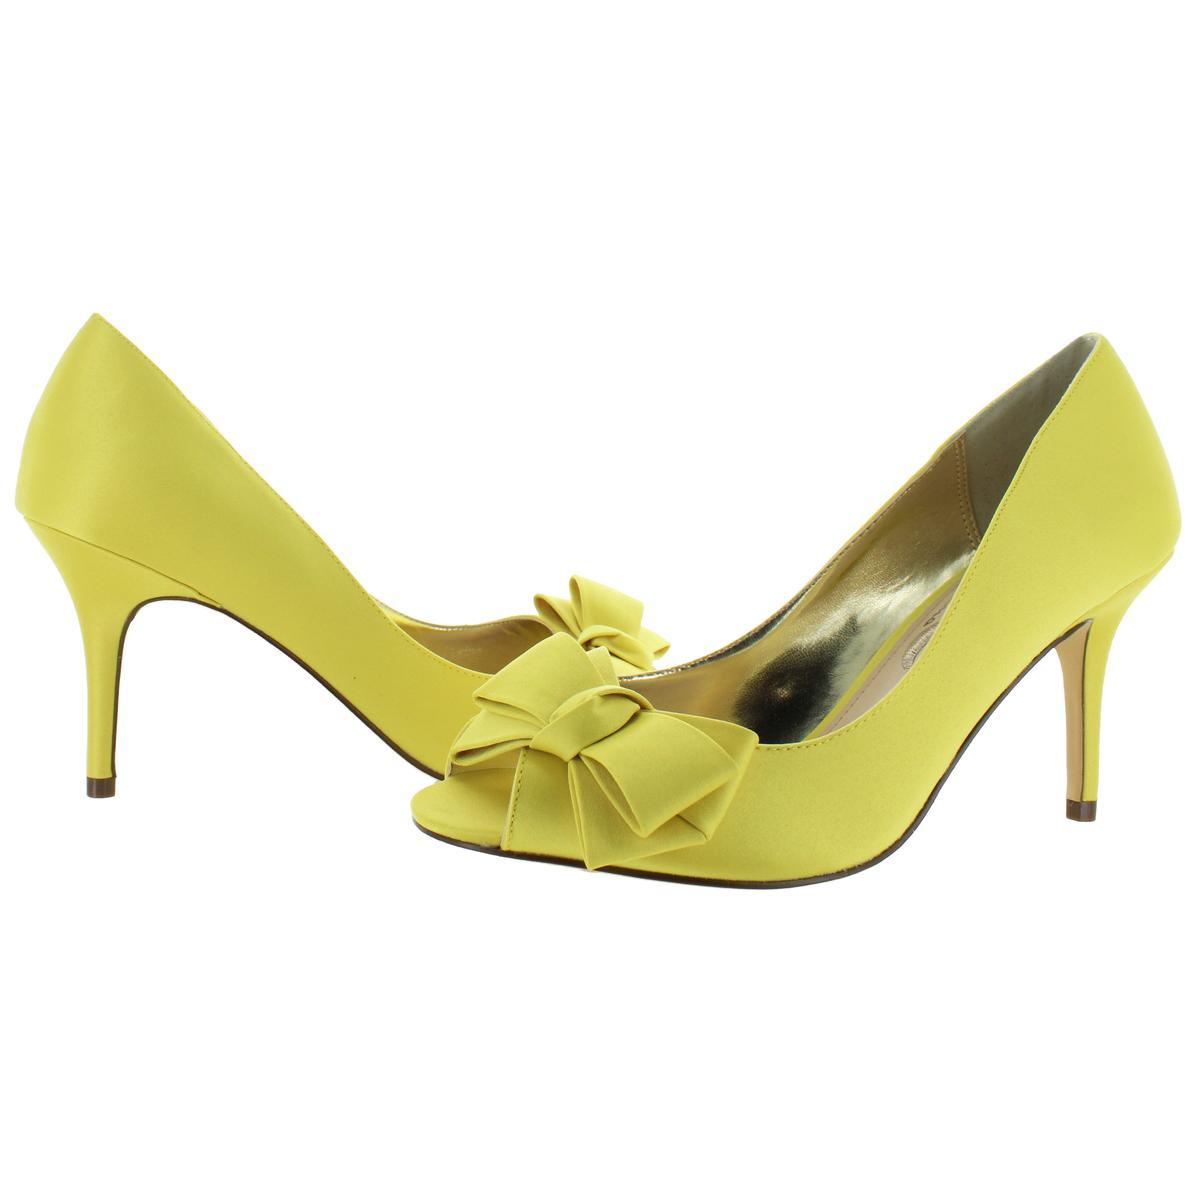 Nina Womens Florice Satin Open Toe Dress Heels Shoes BHFO 3797